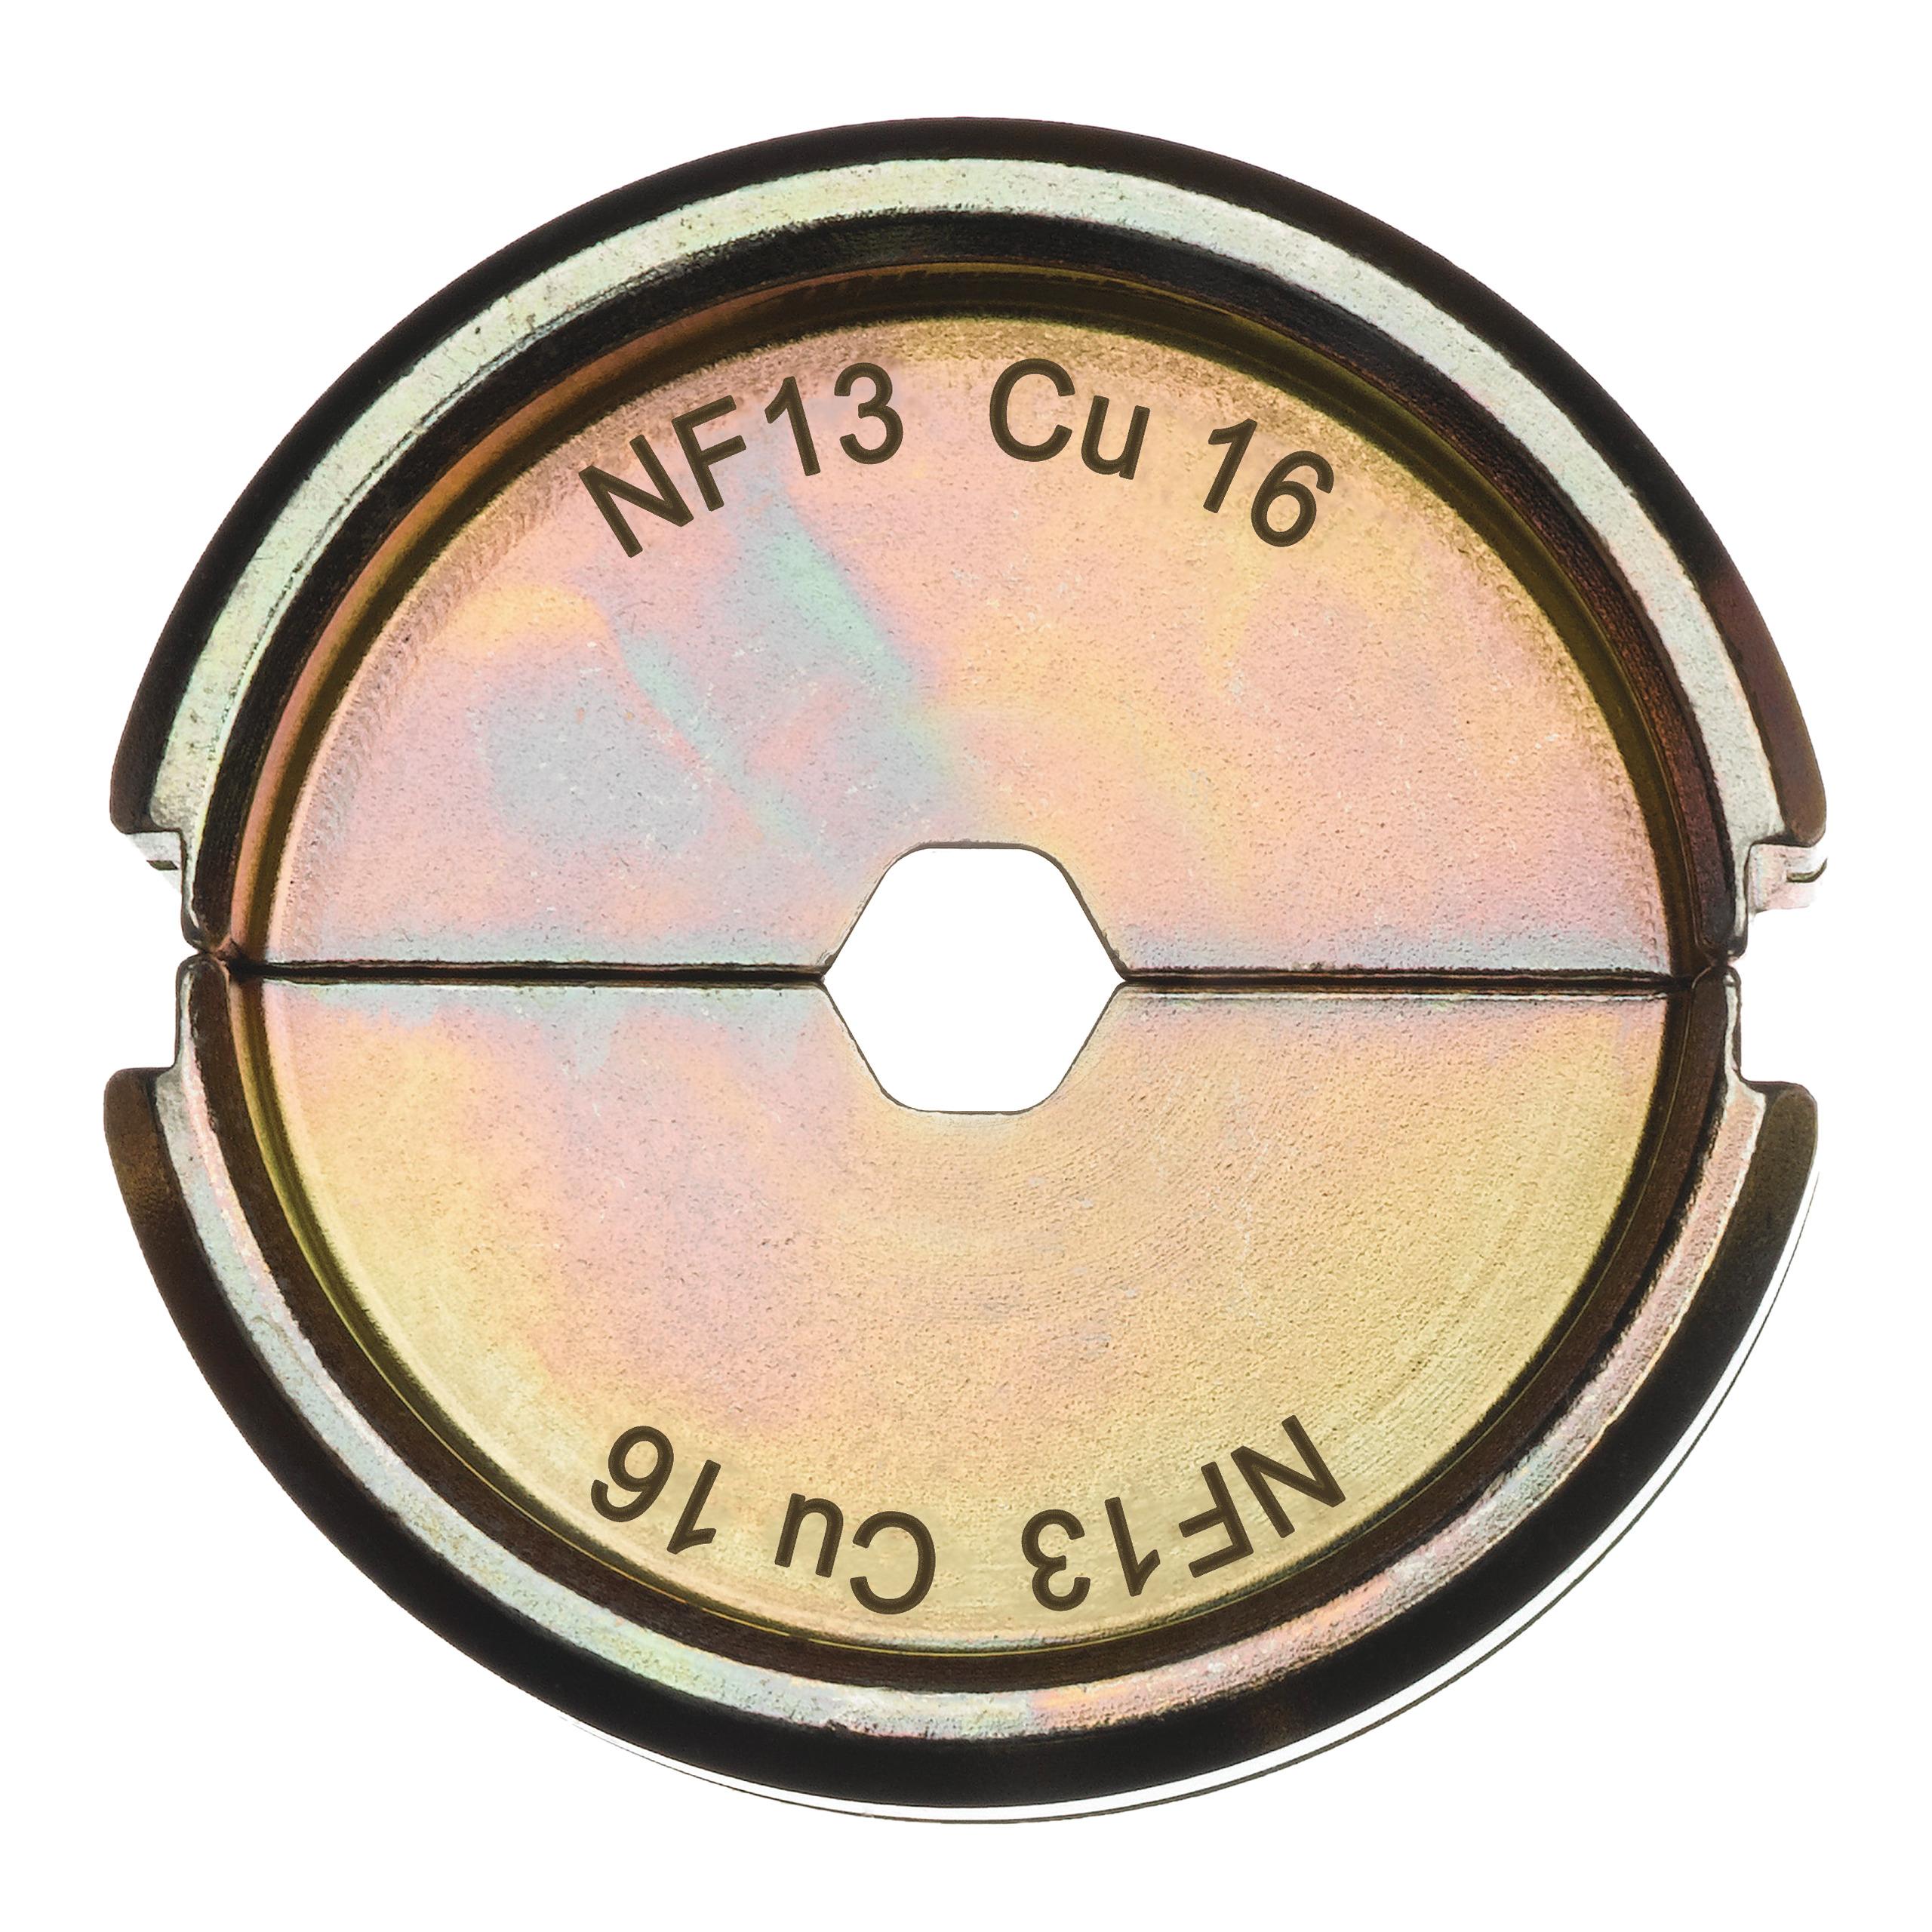 NF13 CU 16-1PC Pojistný kroužek